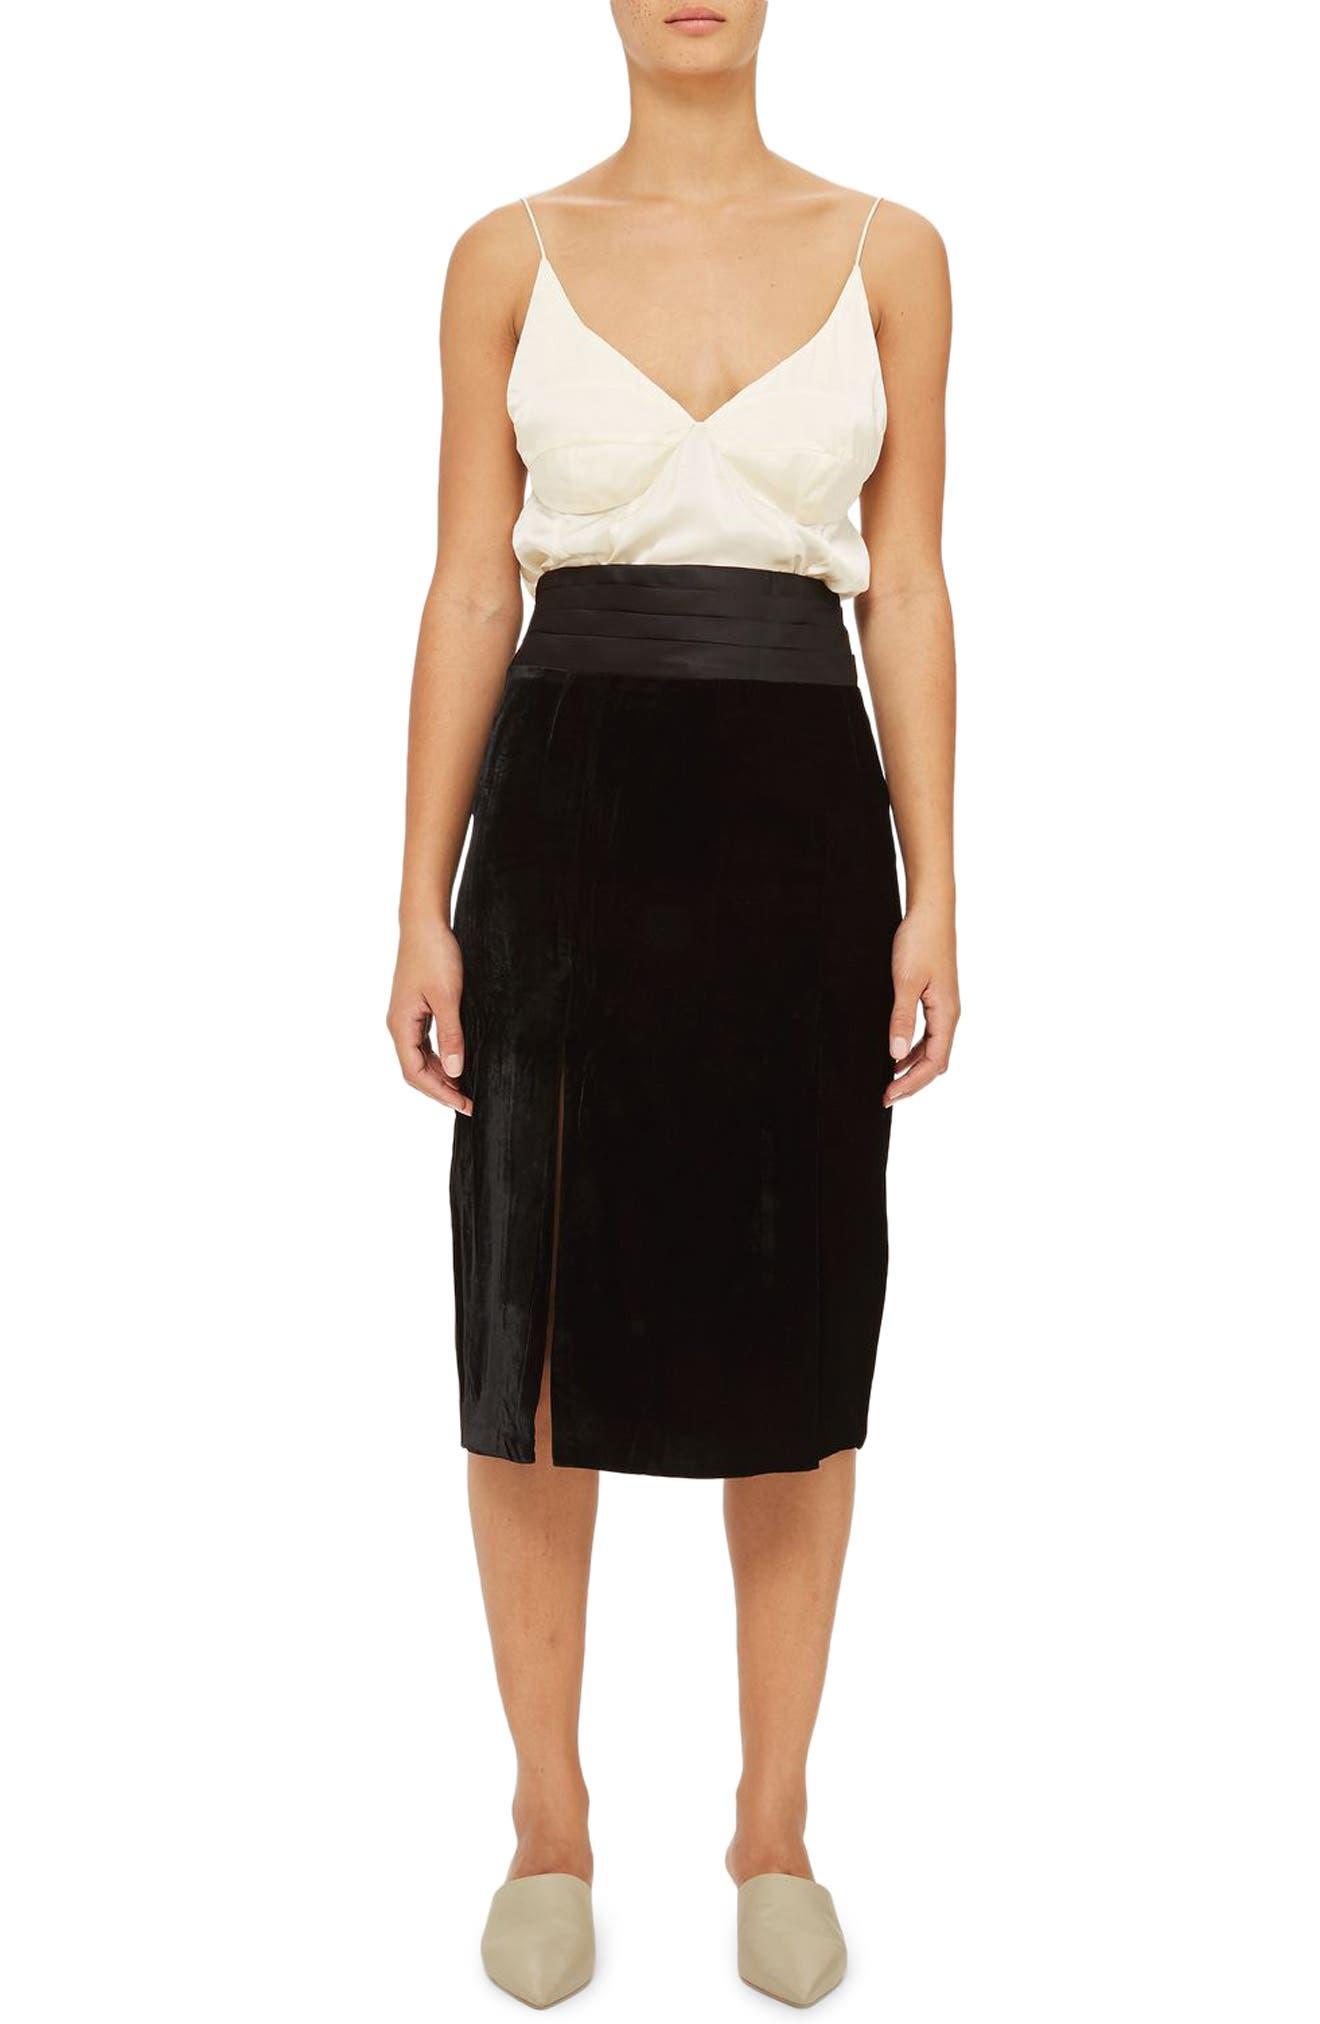 Topshop Cummerbund Skirt